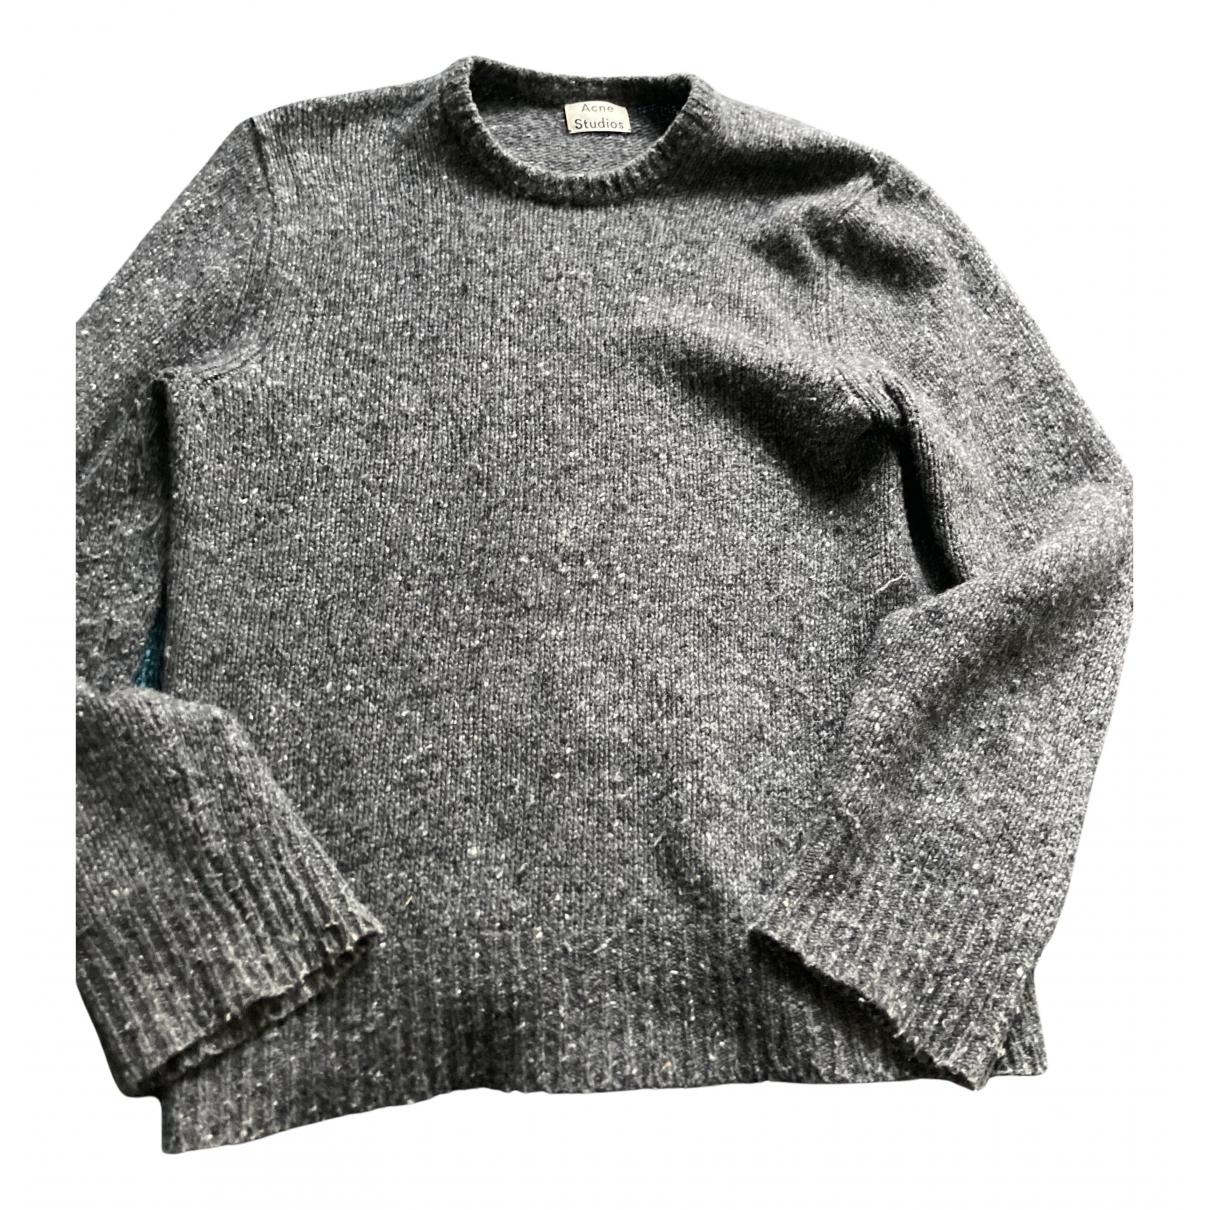 Acne Studios N Grey Wool Knitwear for Women M International